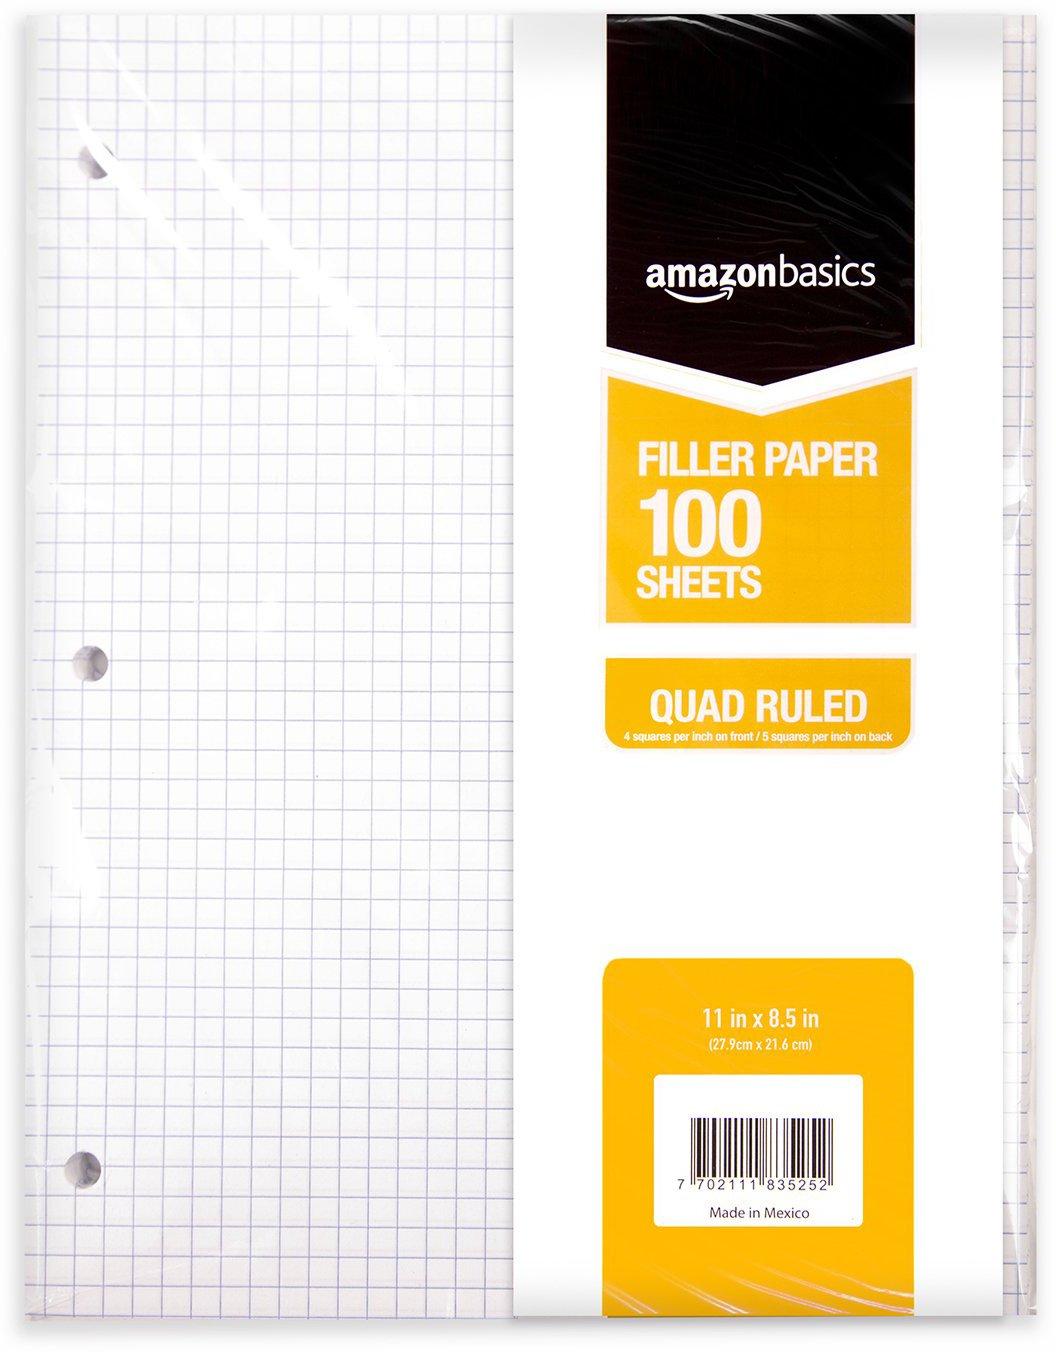 "AmazonBasics Graph Ruled Loose Leaf Filler Paper, 100-Sheet, 11"" x 8.5"", 6-Pack - 583524"